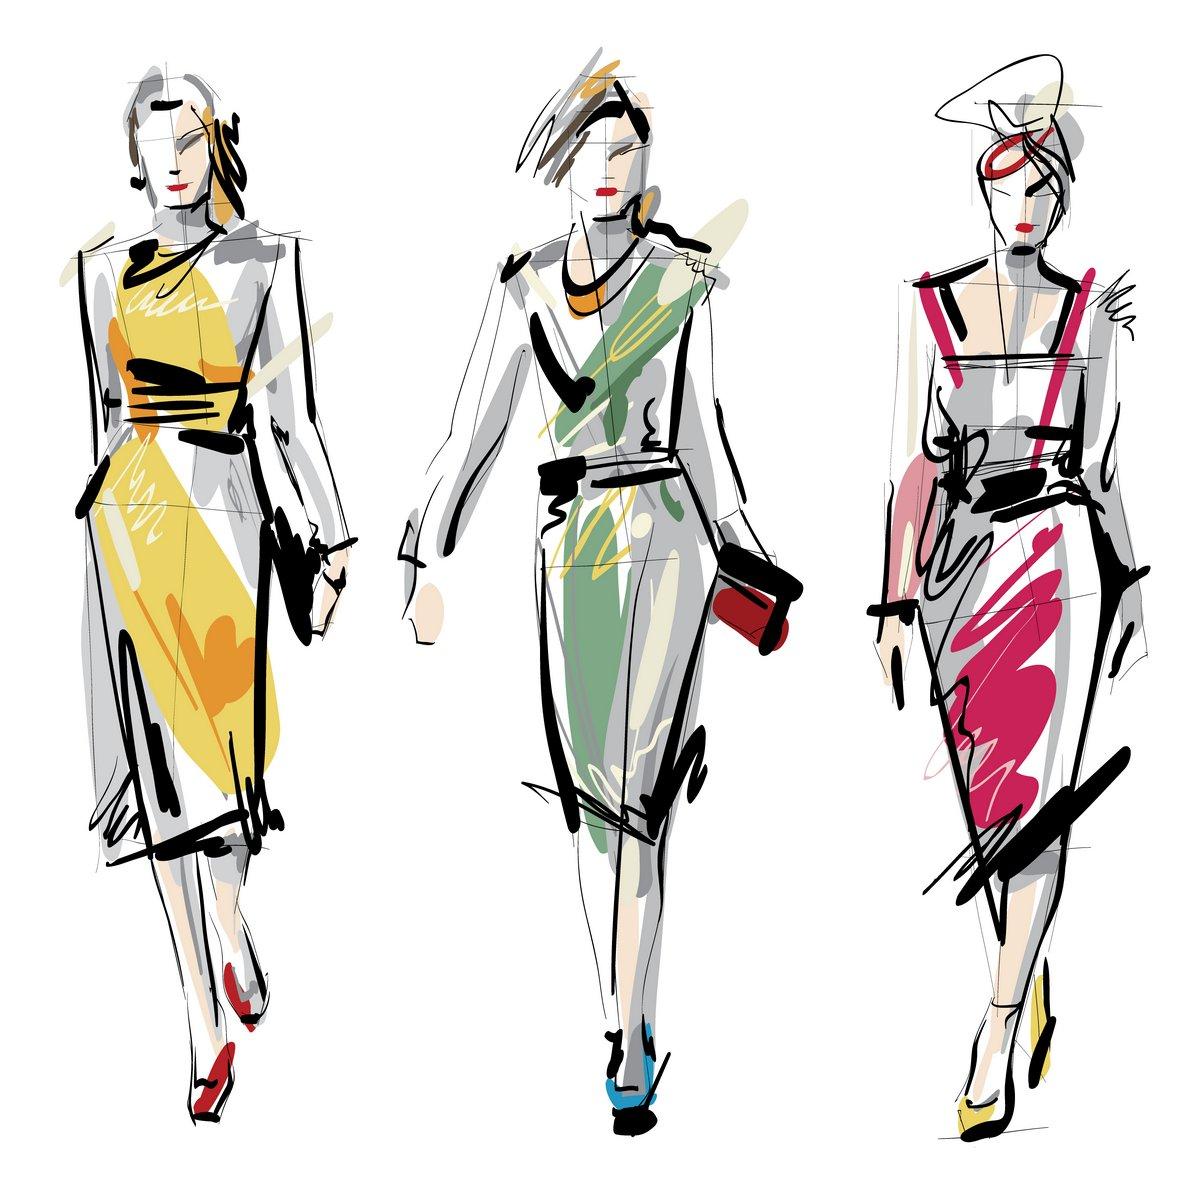 Рисунок полоски на одежде